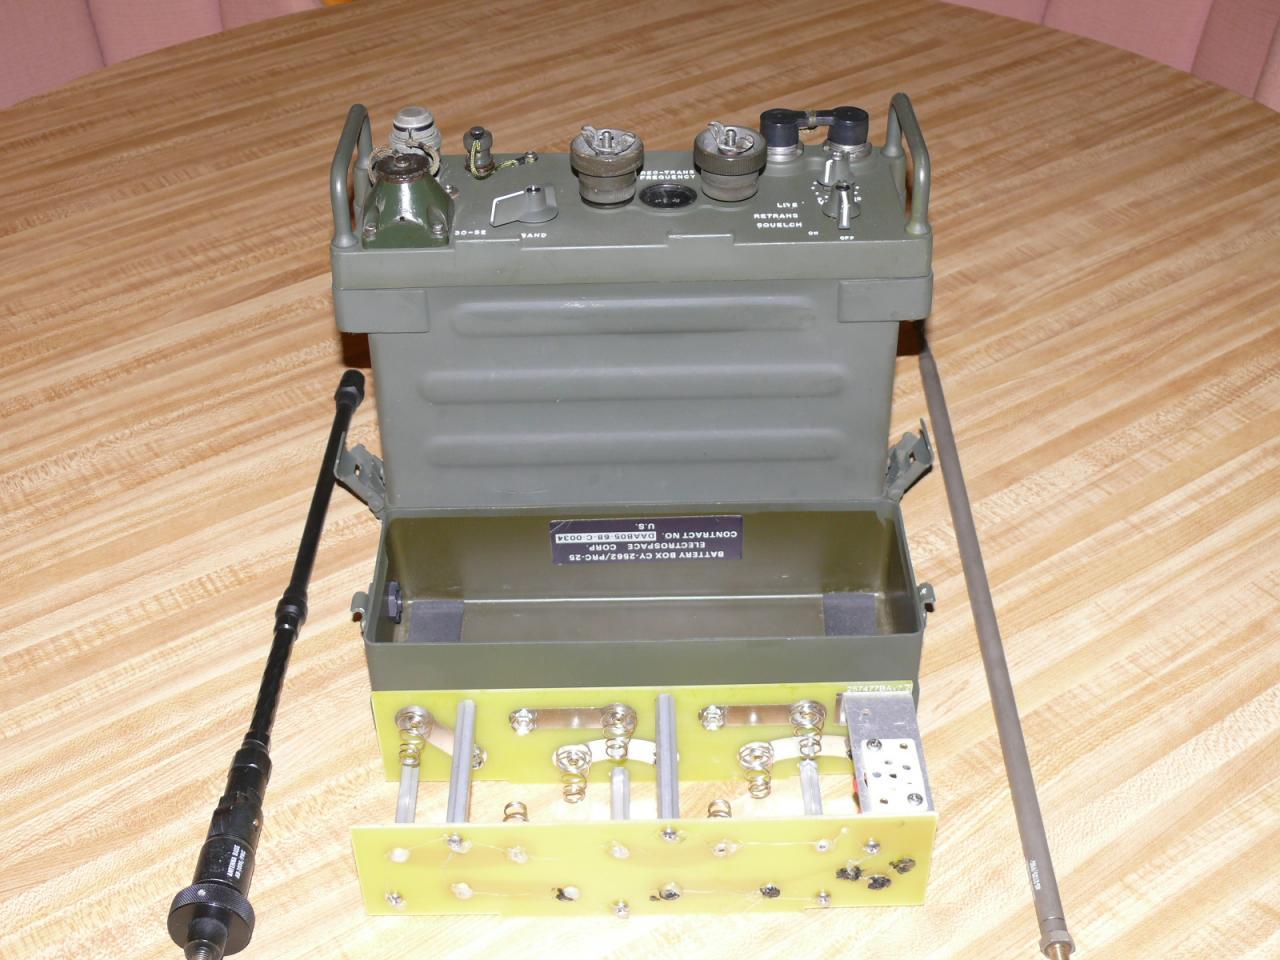 WTS PRC-77 radios